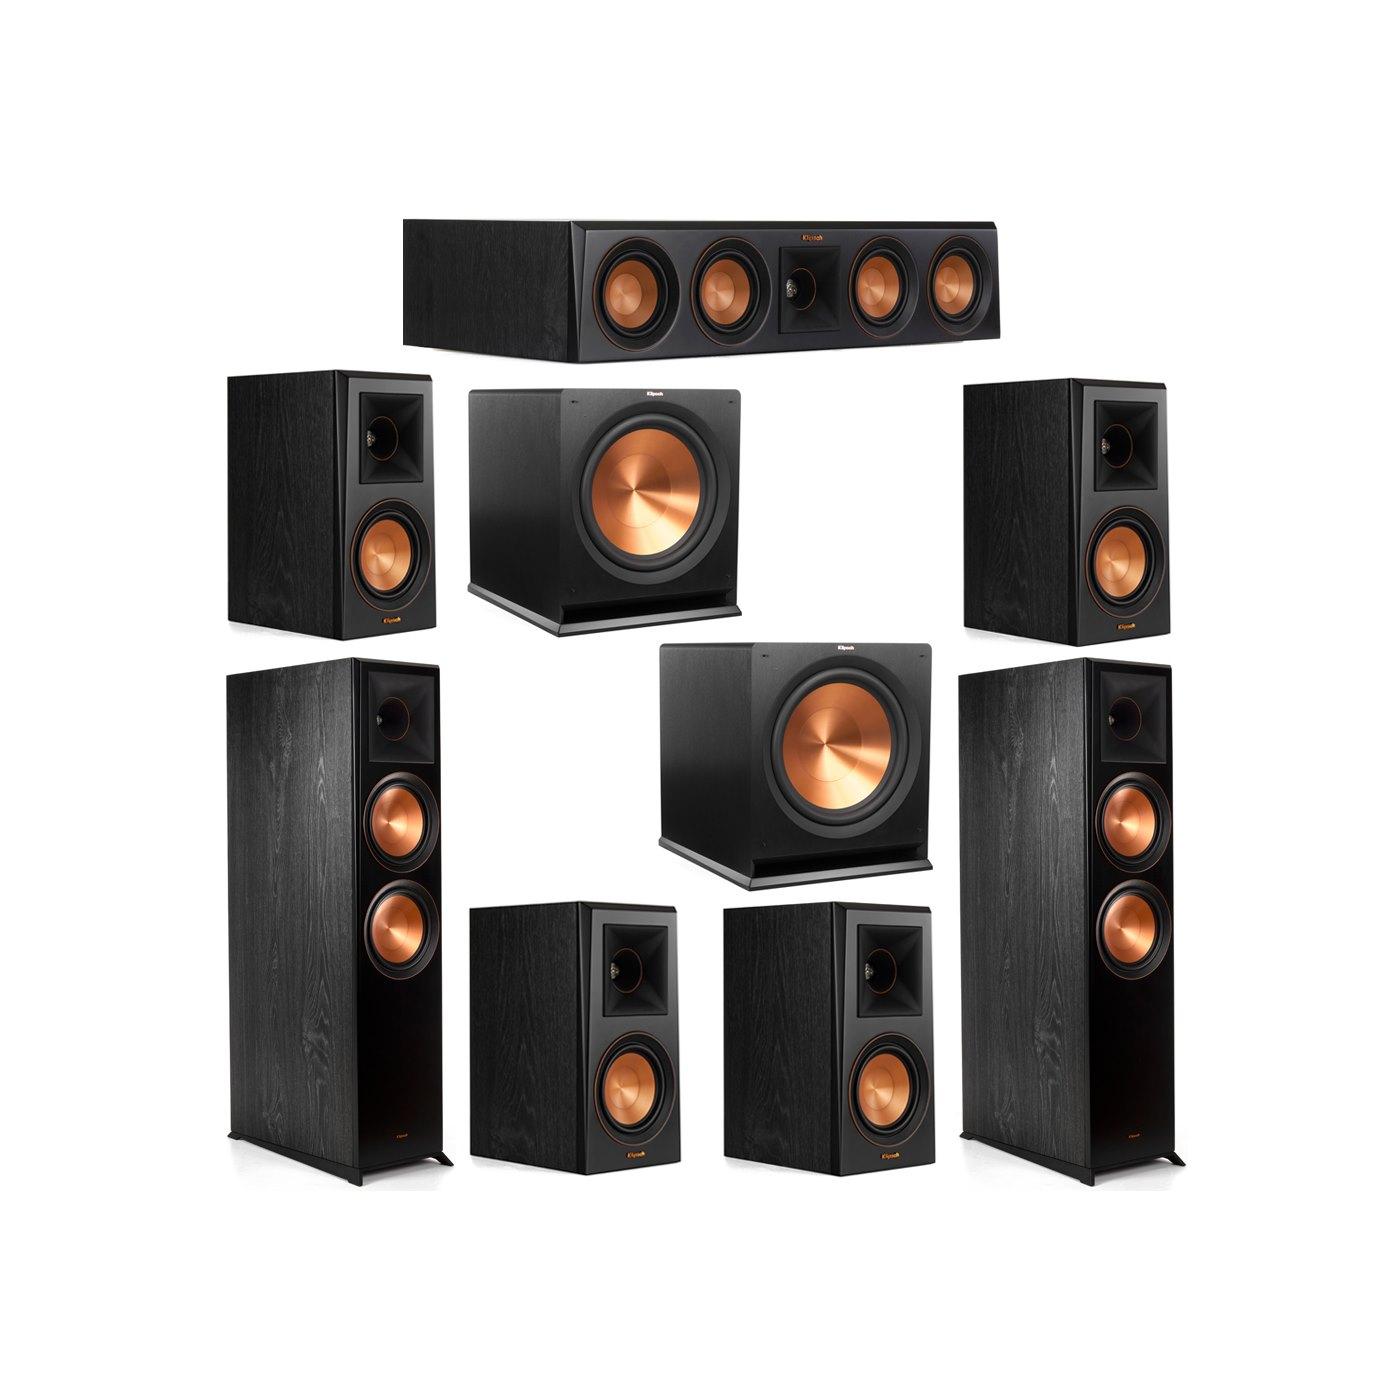 Klipsch 7.2 System with 2 RP-8000F Floorstanding Speakers, 1 Klipsch RP-404C Center Speaker, 4 Klipsch RP-500M Surround Speakers, 2 Klipsch R-115SW Subwoofers